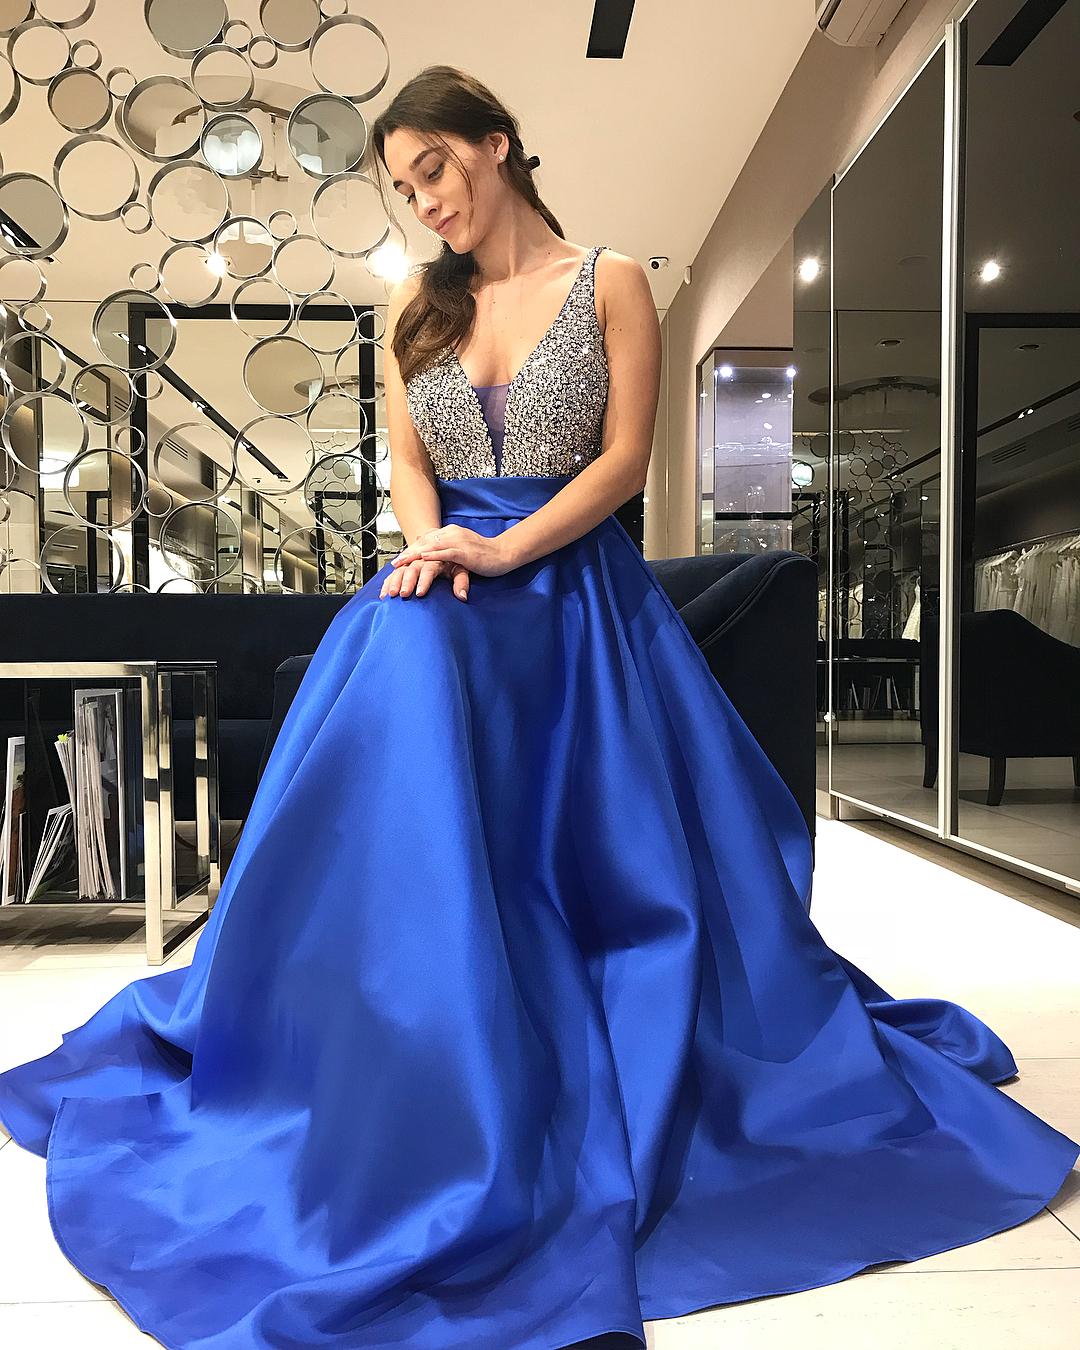 d65c2570b44 Sparkly Sequins Royal Blue Long Prom Dress · modsele · Online Store ...